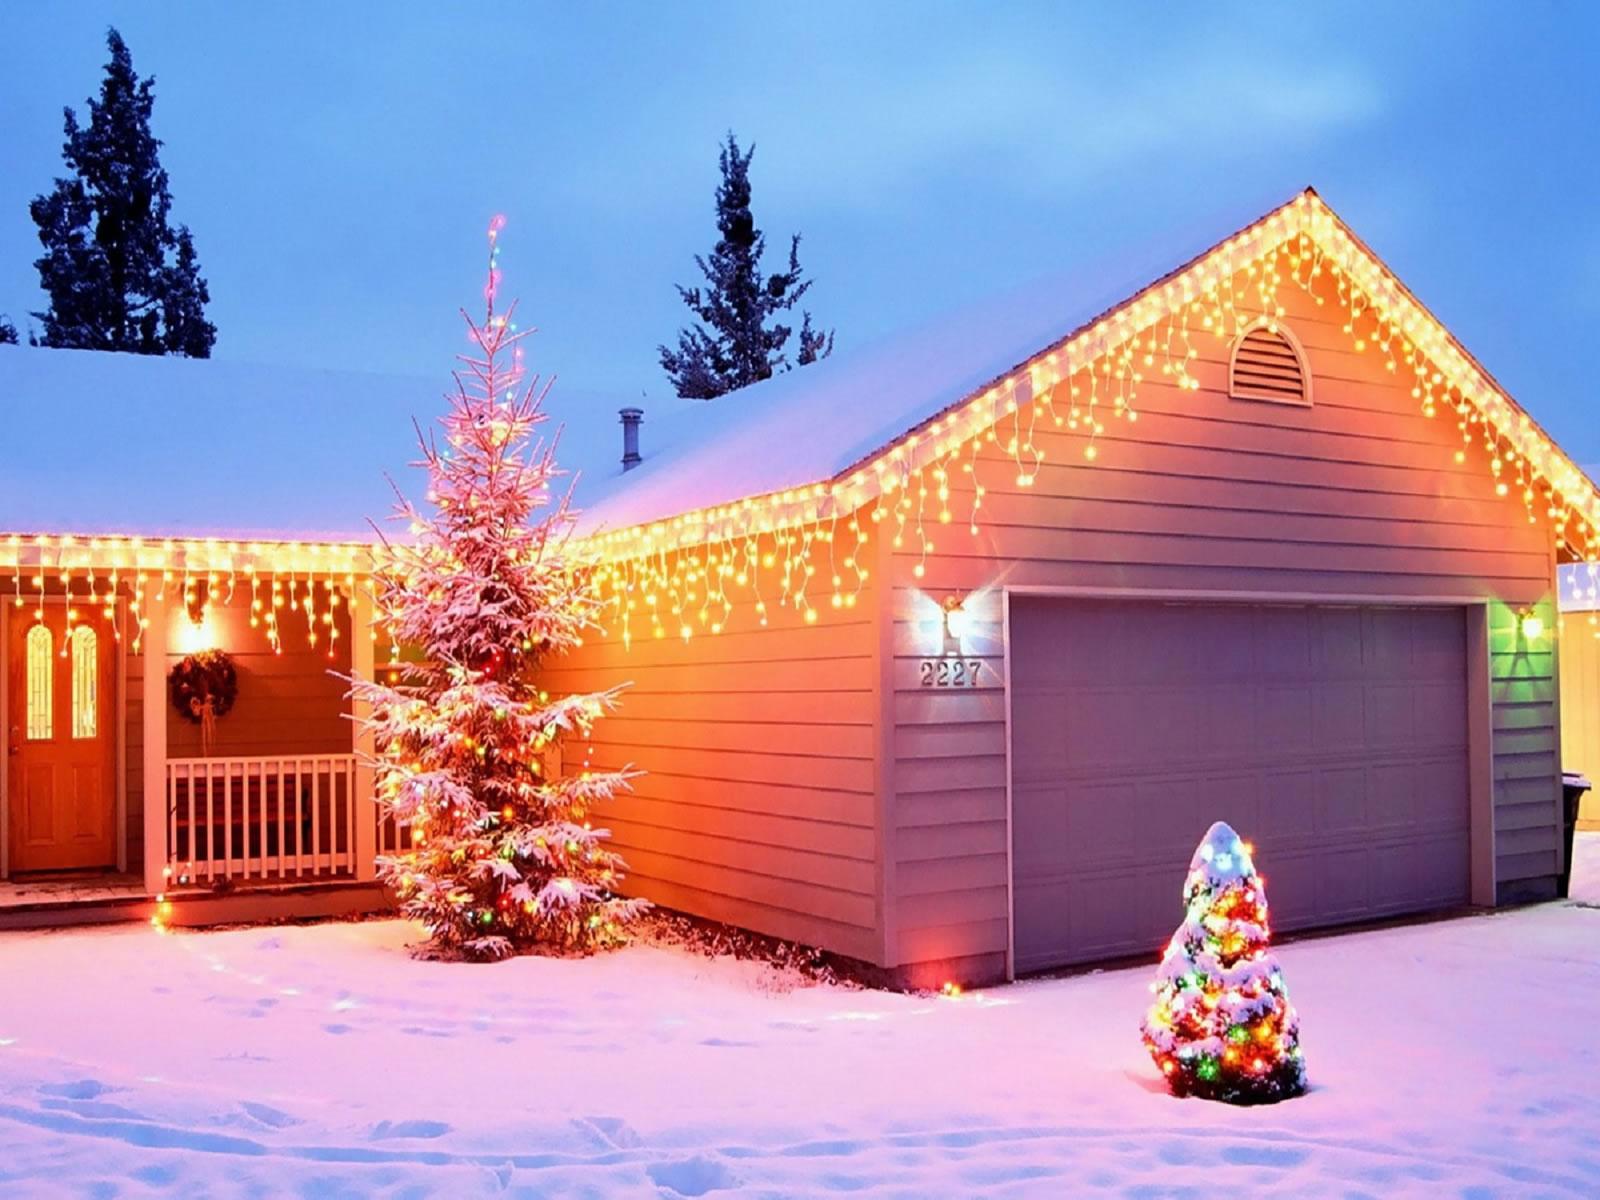 decoracao de natal para interiores de casas : decoracao de natal para interiores de casas:Decoração de Natal – Decoração em Decoracao 10